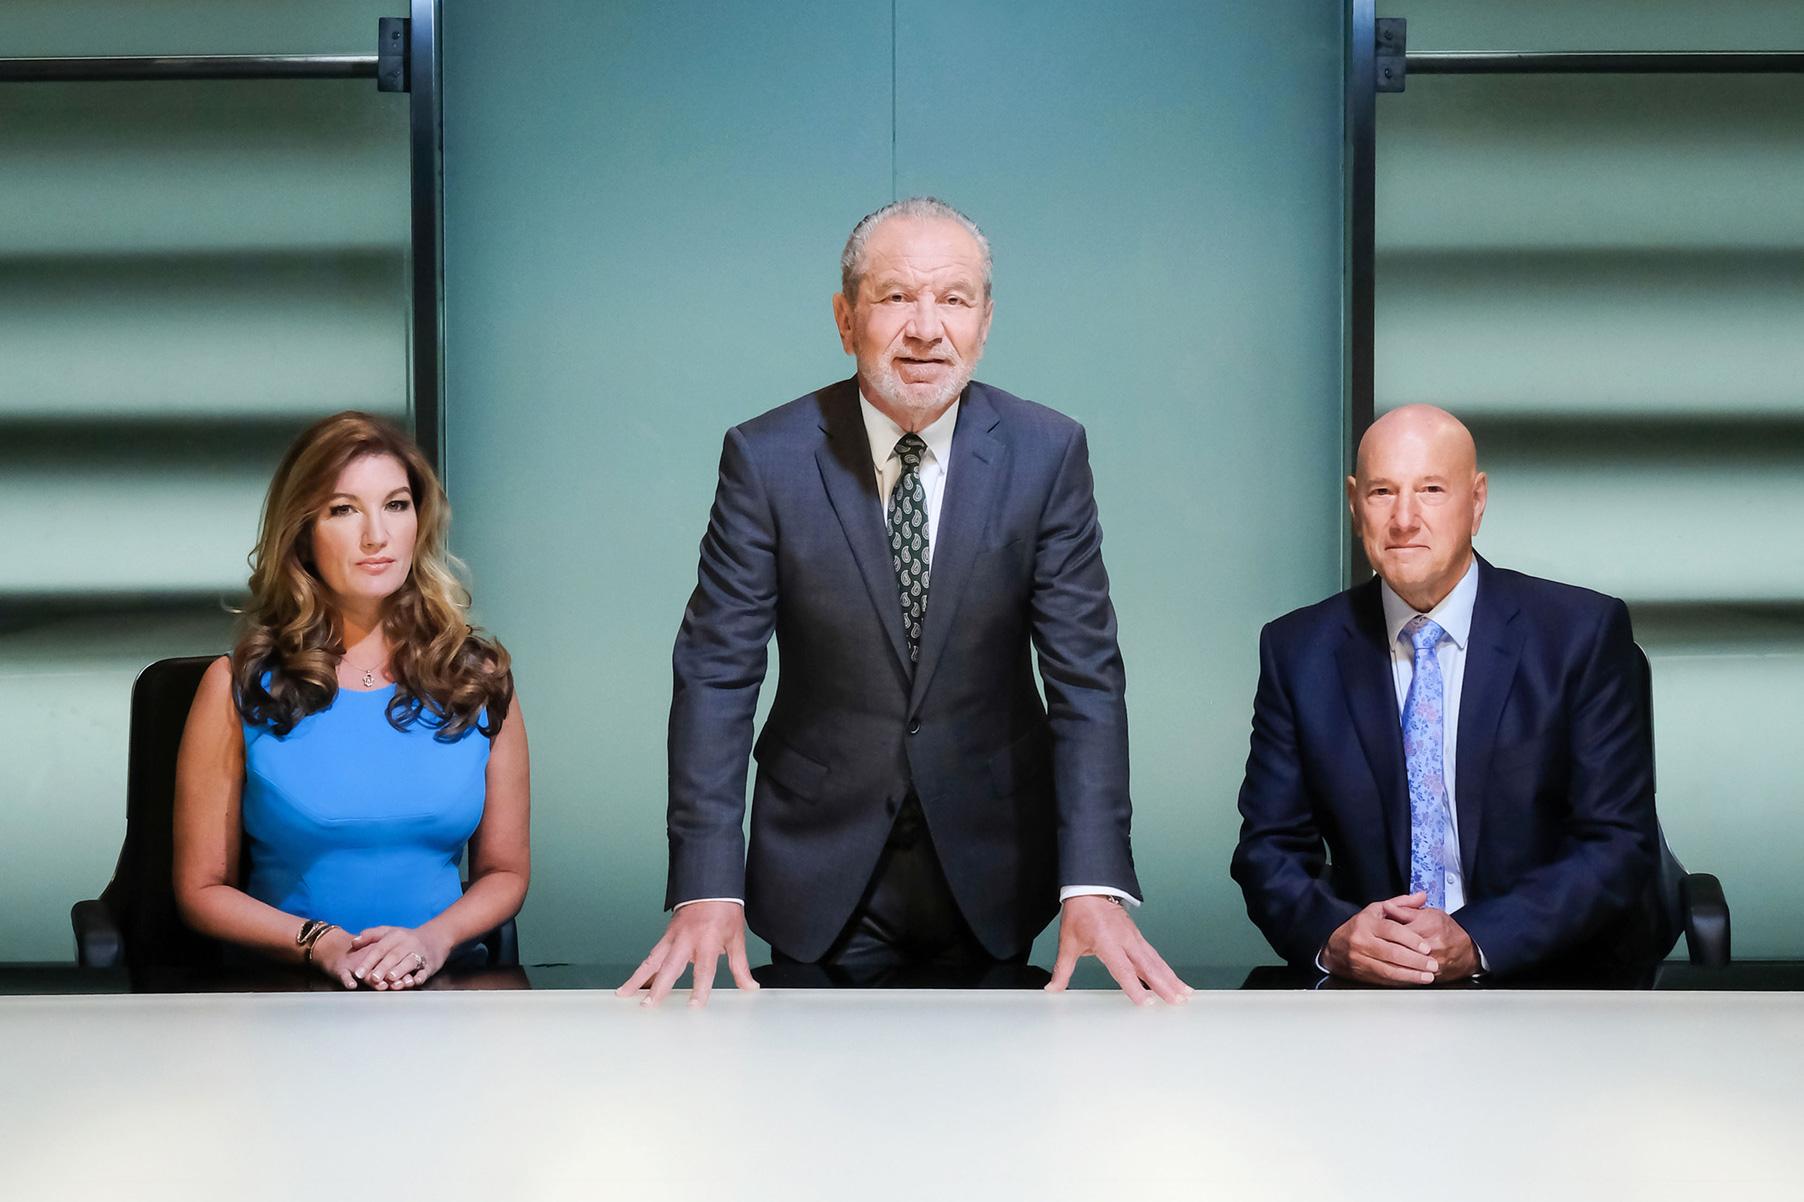 The Apprentice's Lord Sugar, Karren Brady and Claude Littner